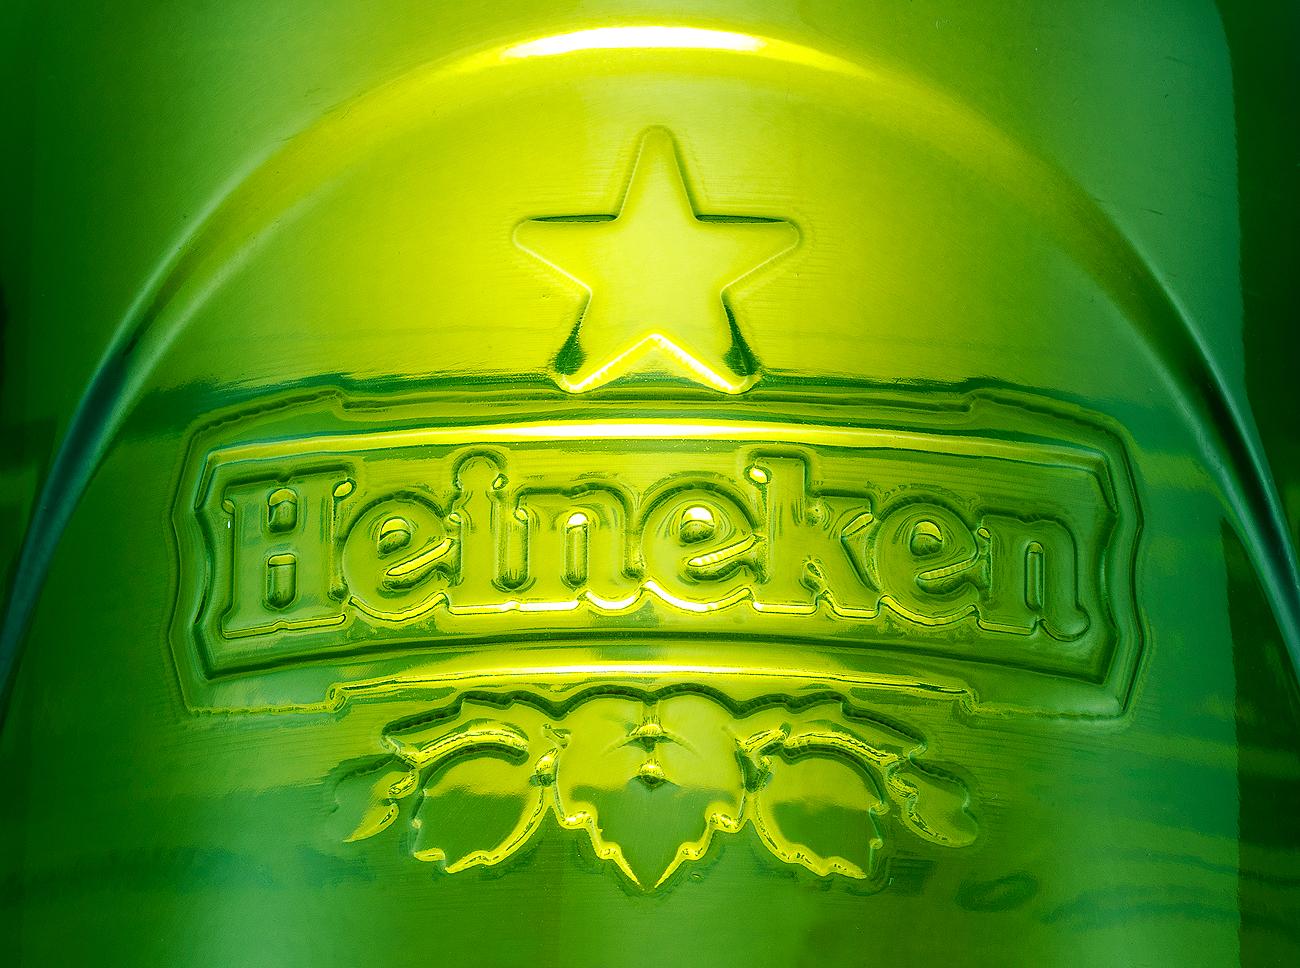 Logo Heineken sur une bouteille de verre Studio28